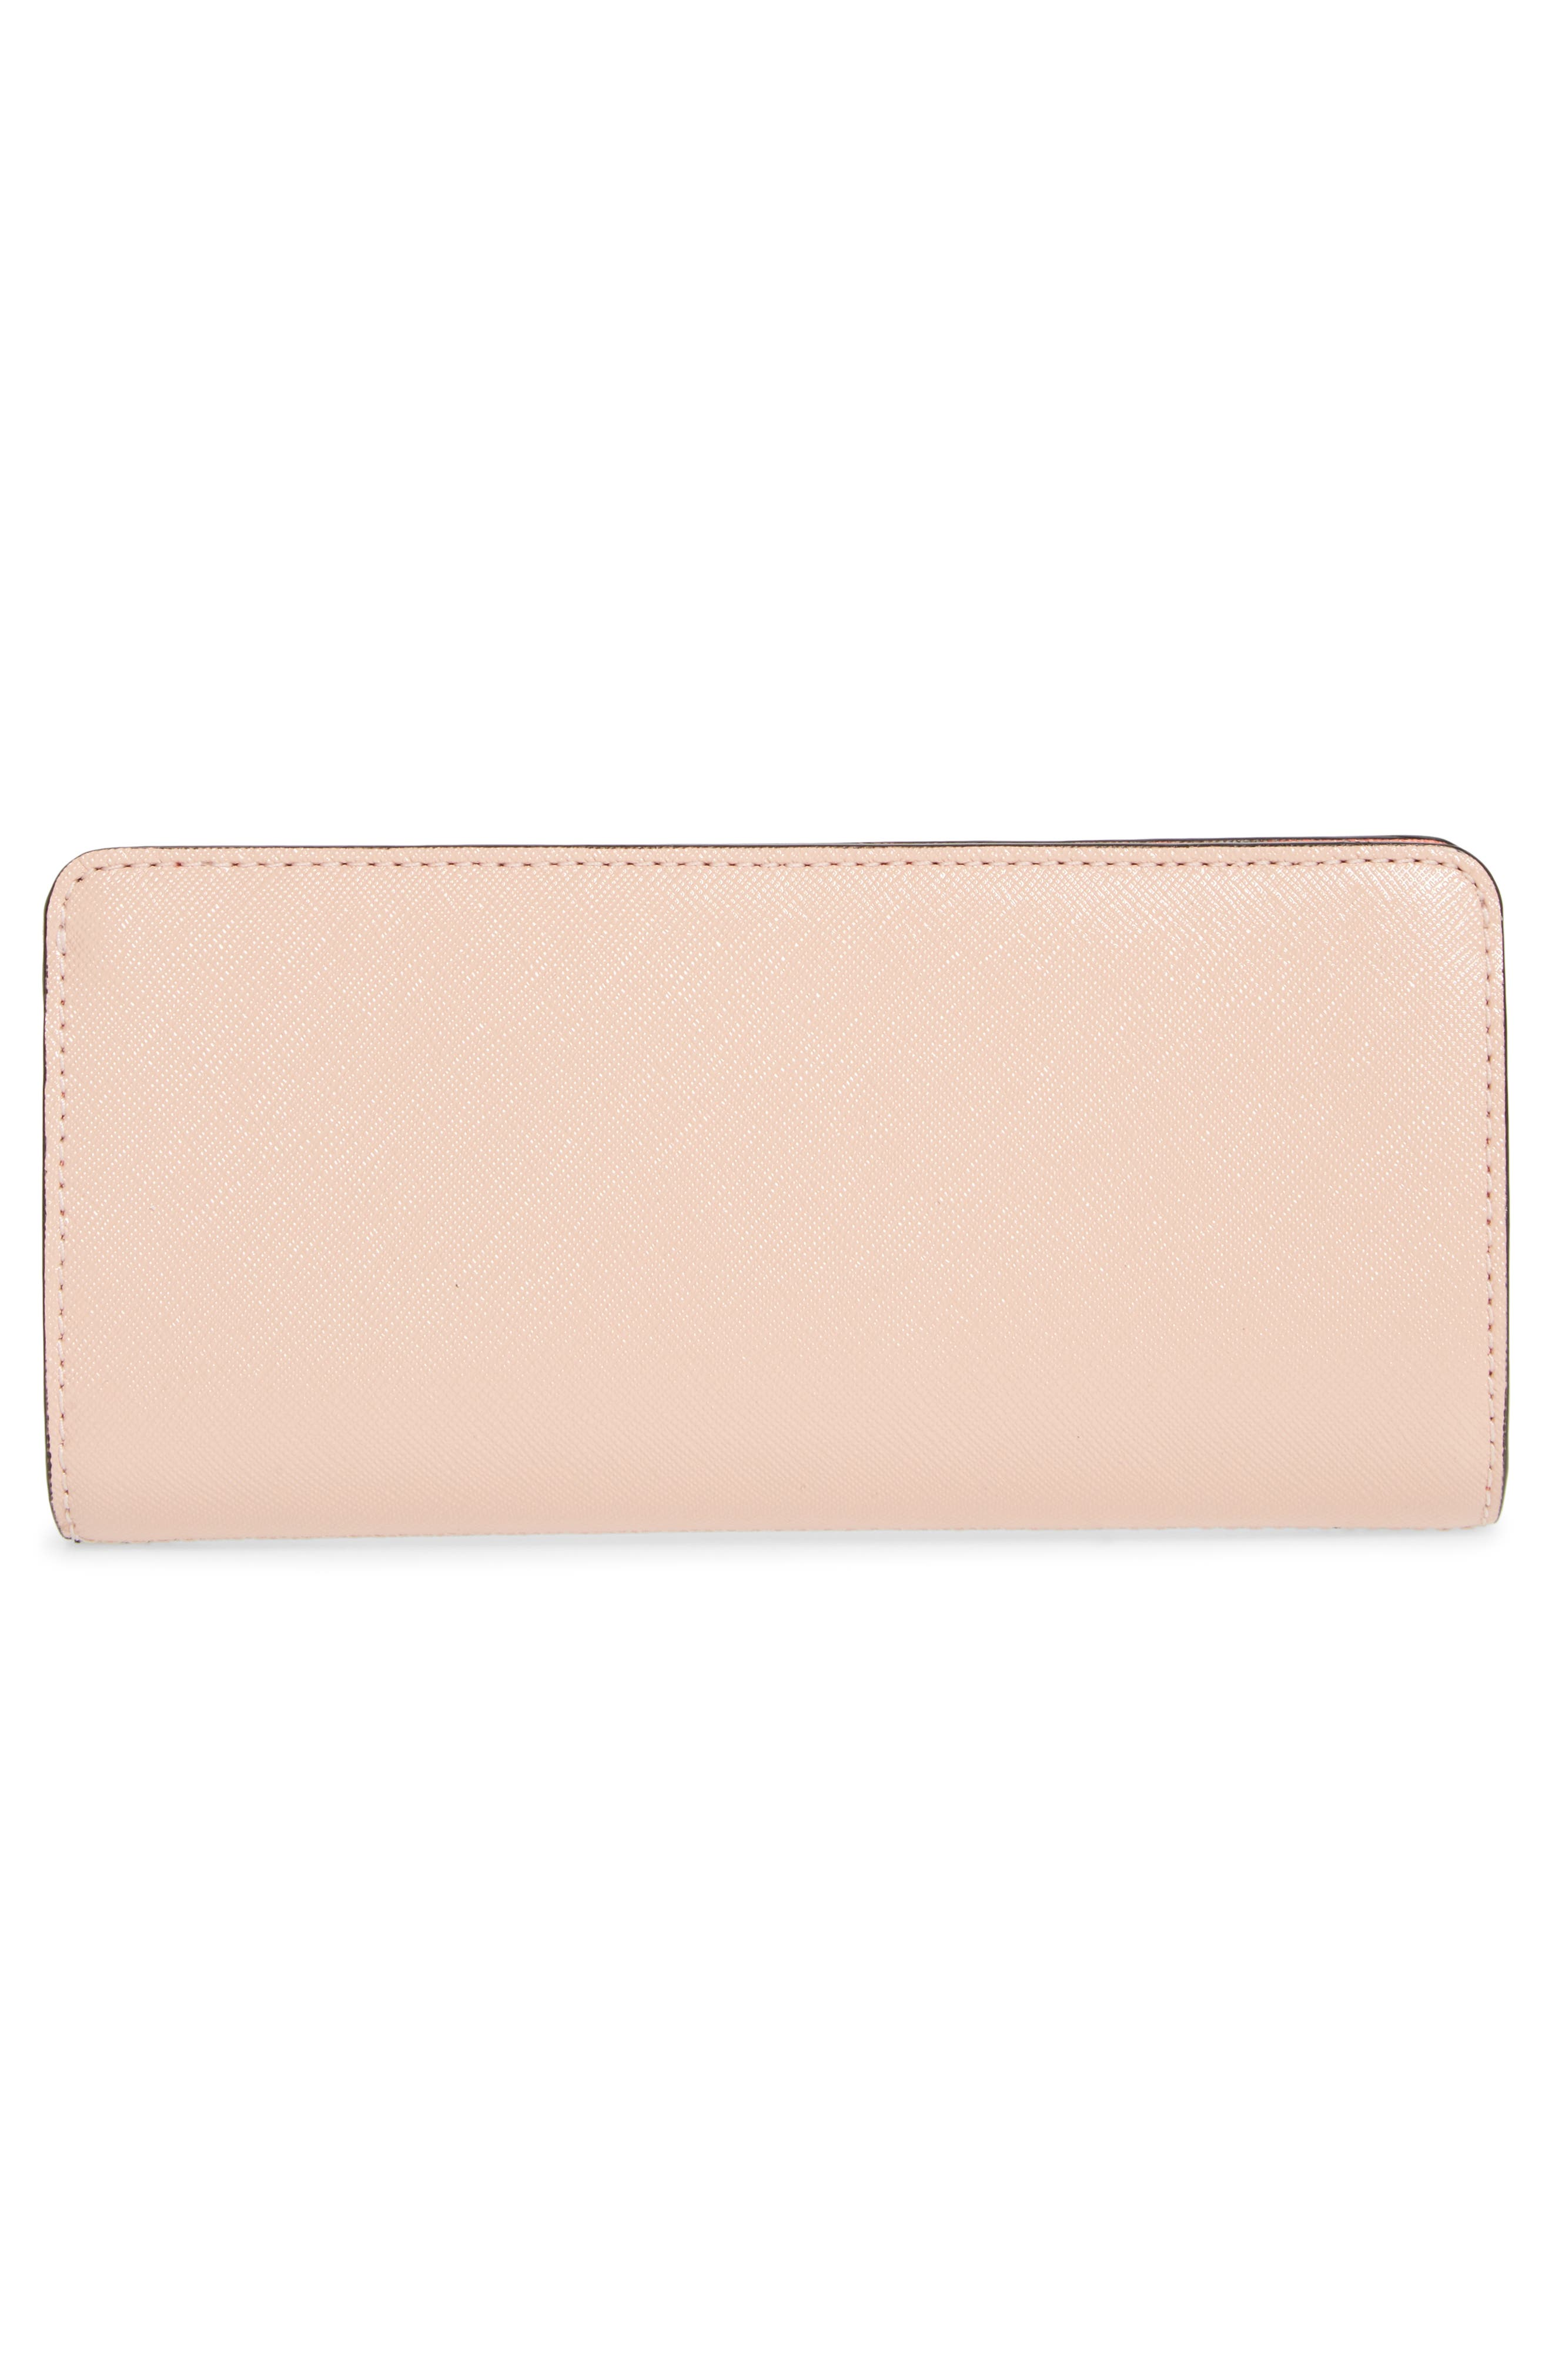 Snapshot Open Face Leather Wallet,                             Alternate thumbnail 3, color,                             BLACK/ ROSE